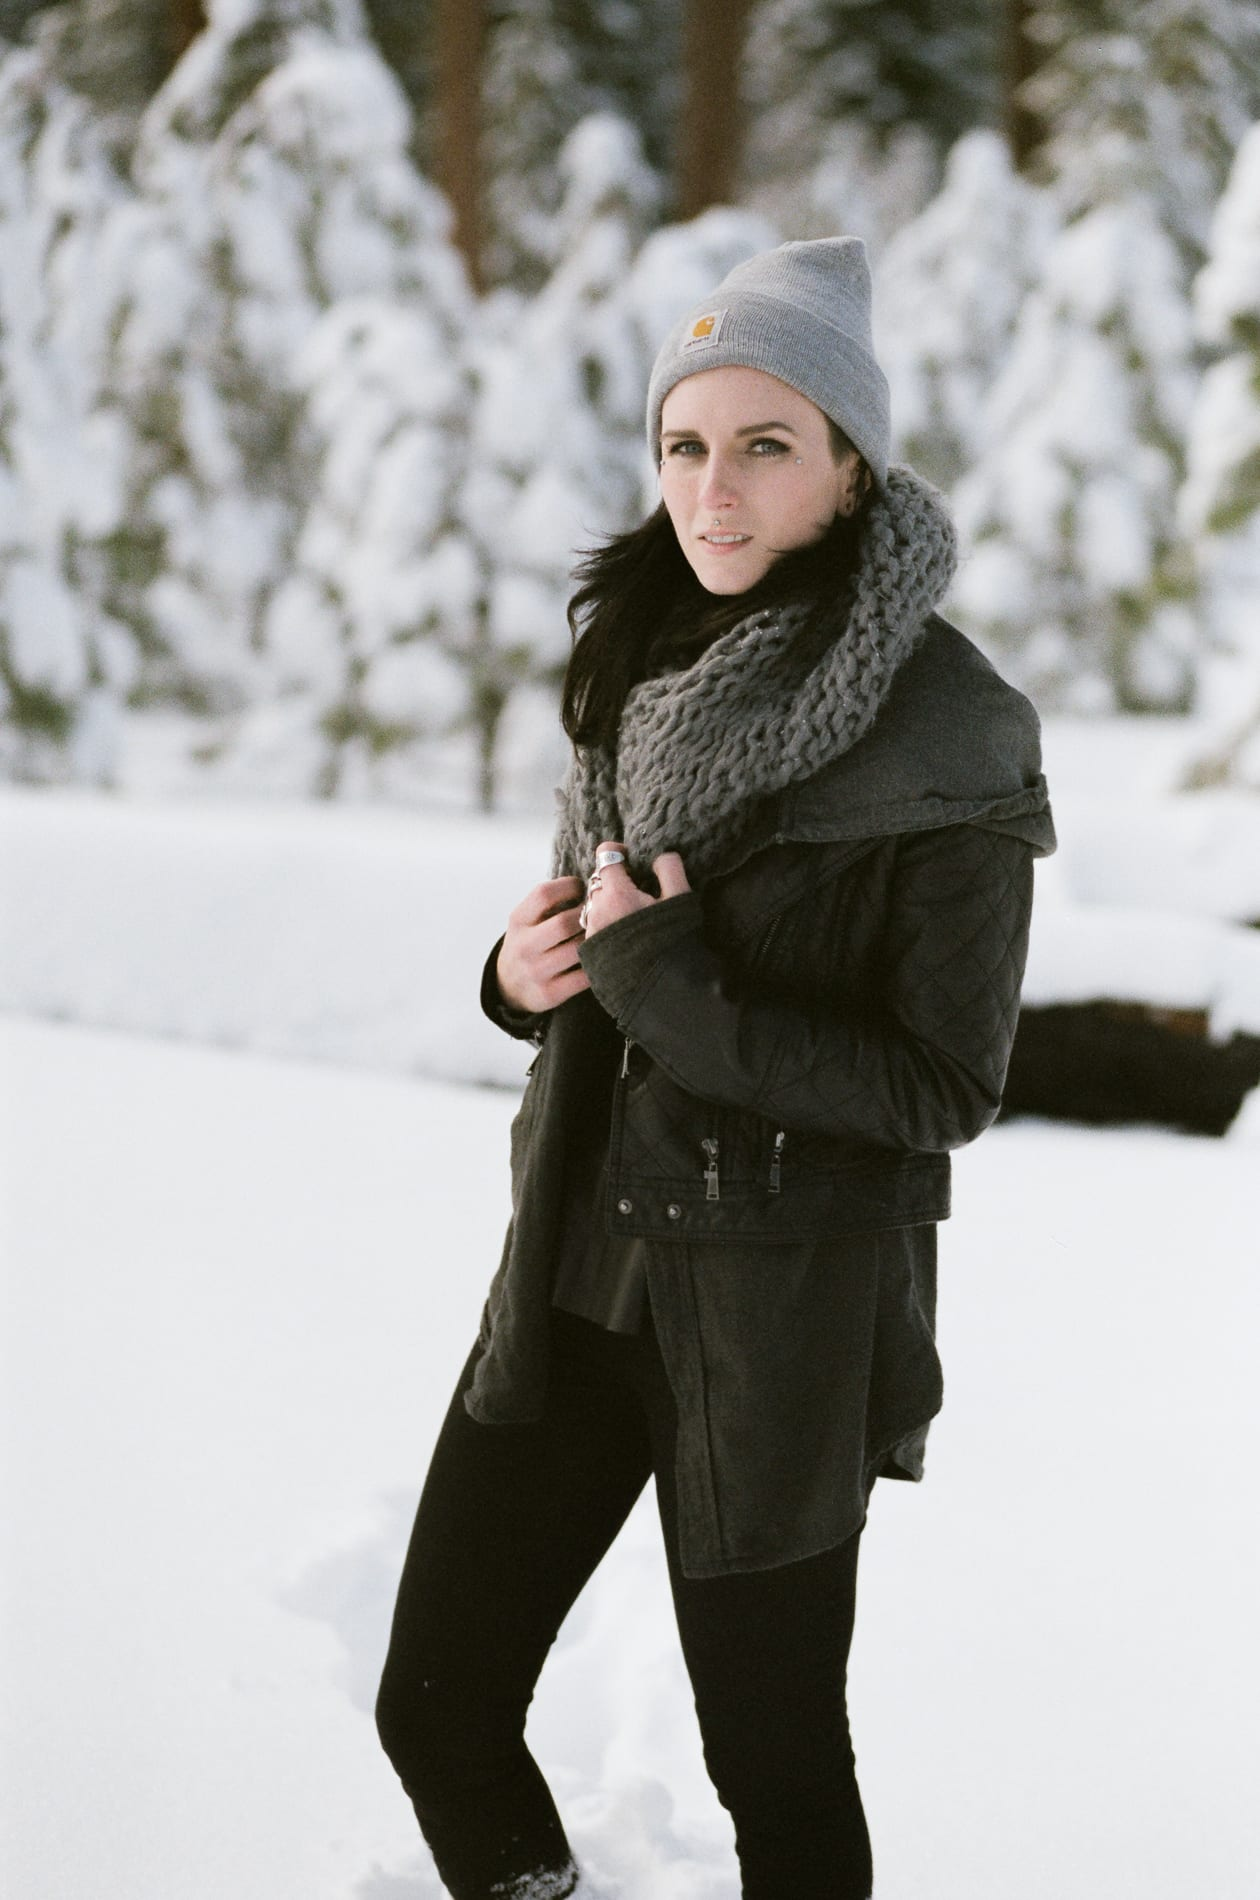 mt-lassen-winter-snow-couples-photo-12